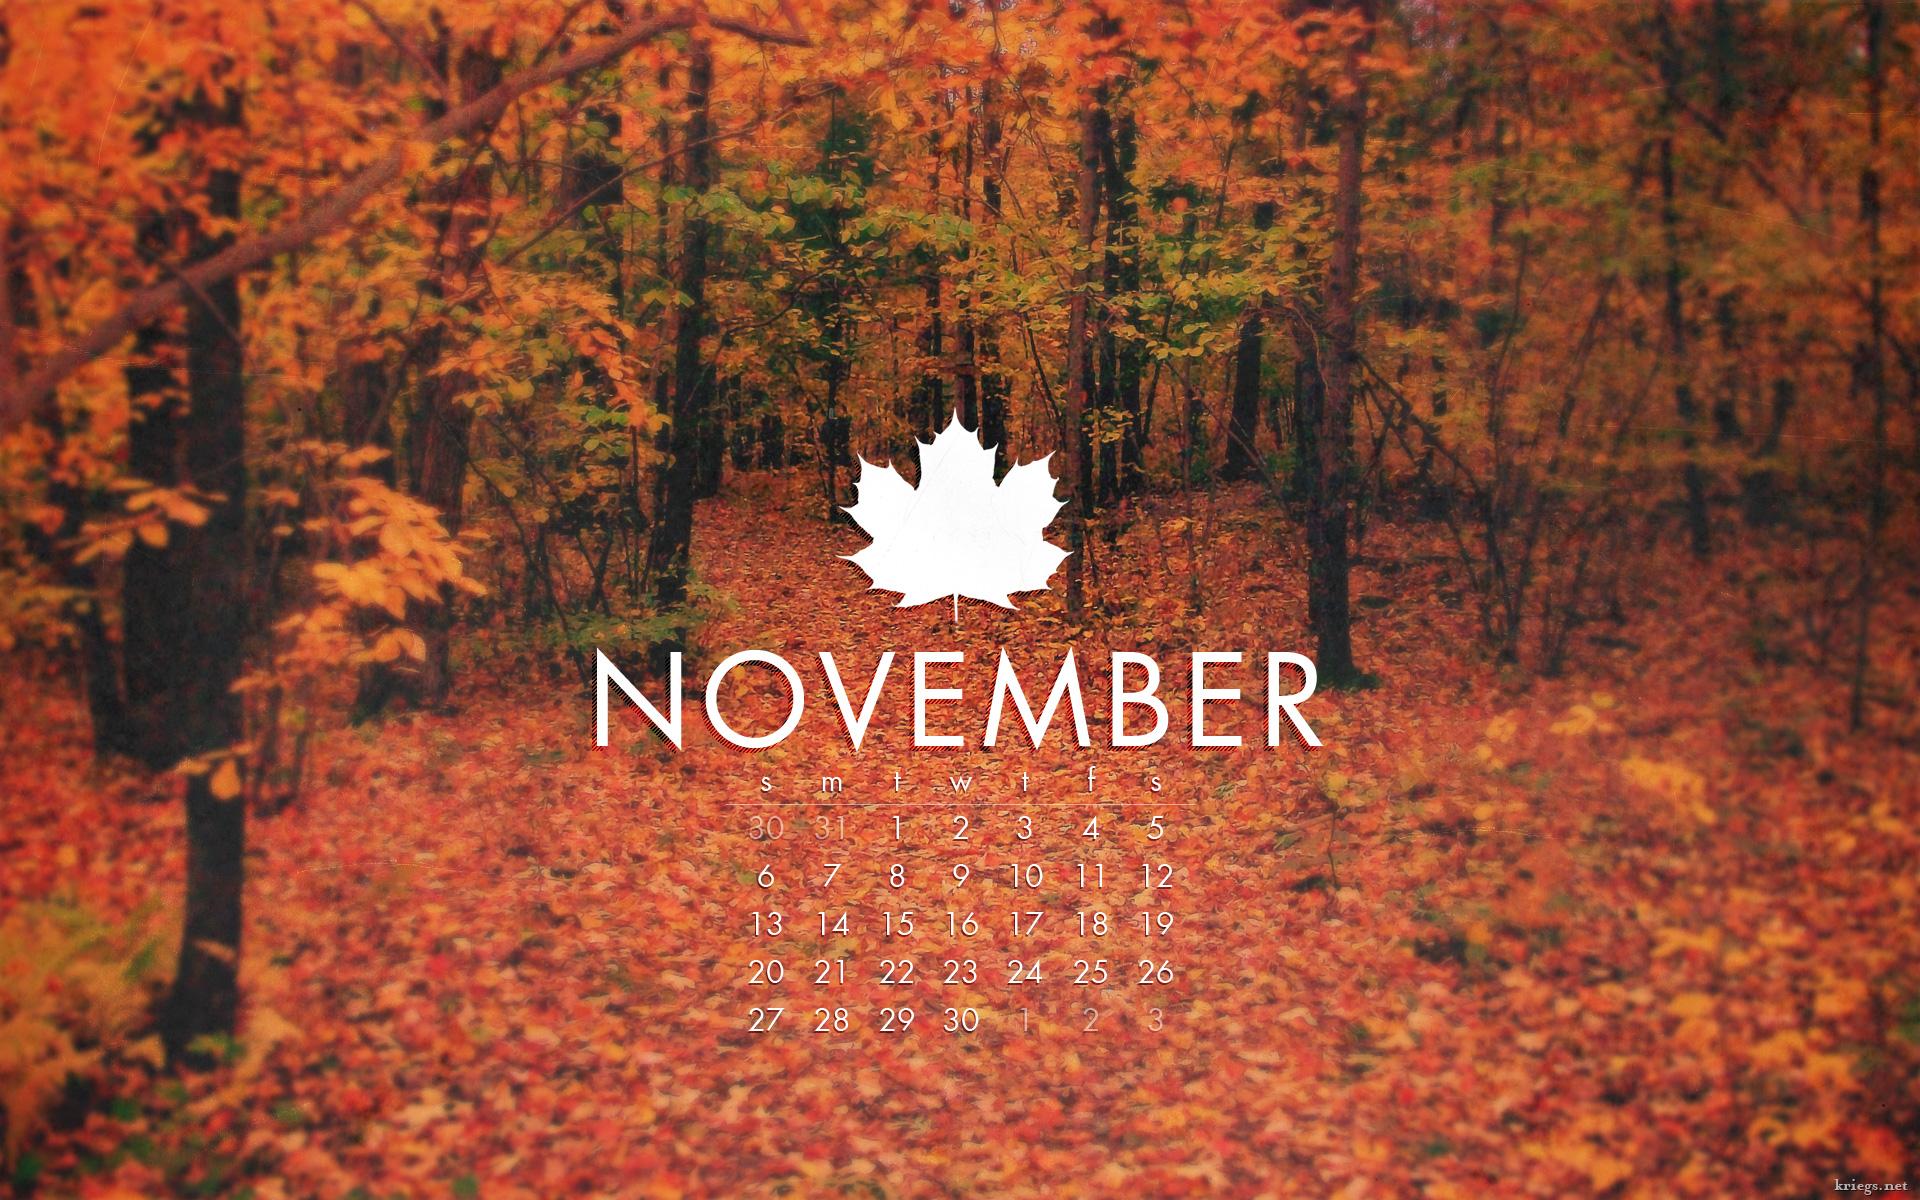 November 2011 by kriegs on DeviantArt